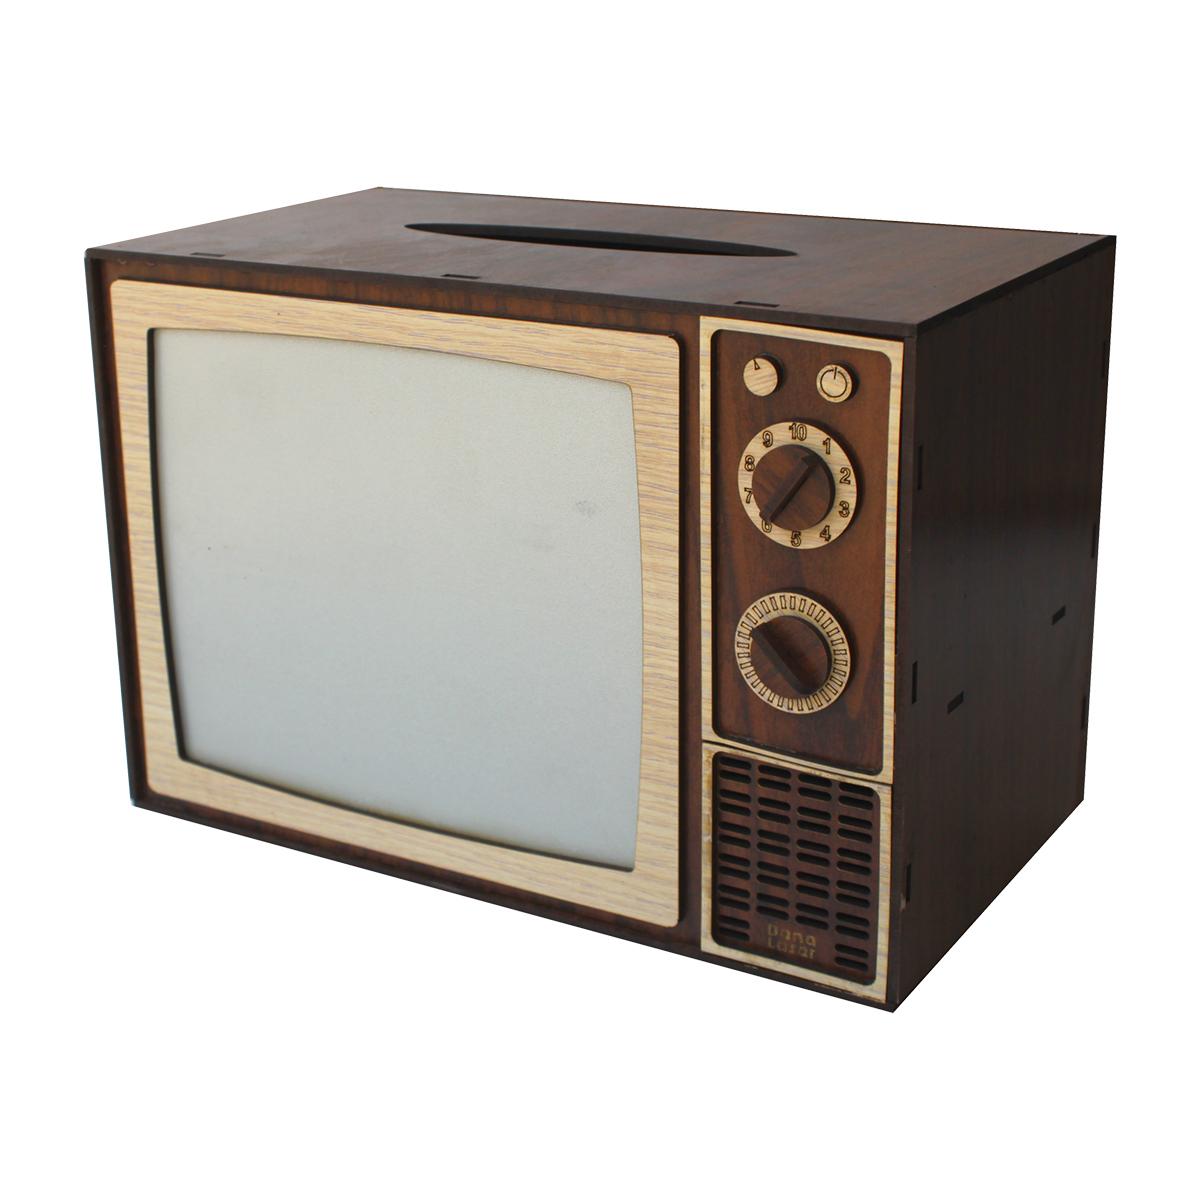 جعبه دستمال کاغذی دنالیزر طرح تلوزیون کدdt1